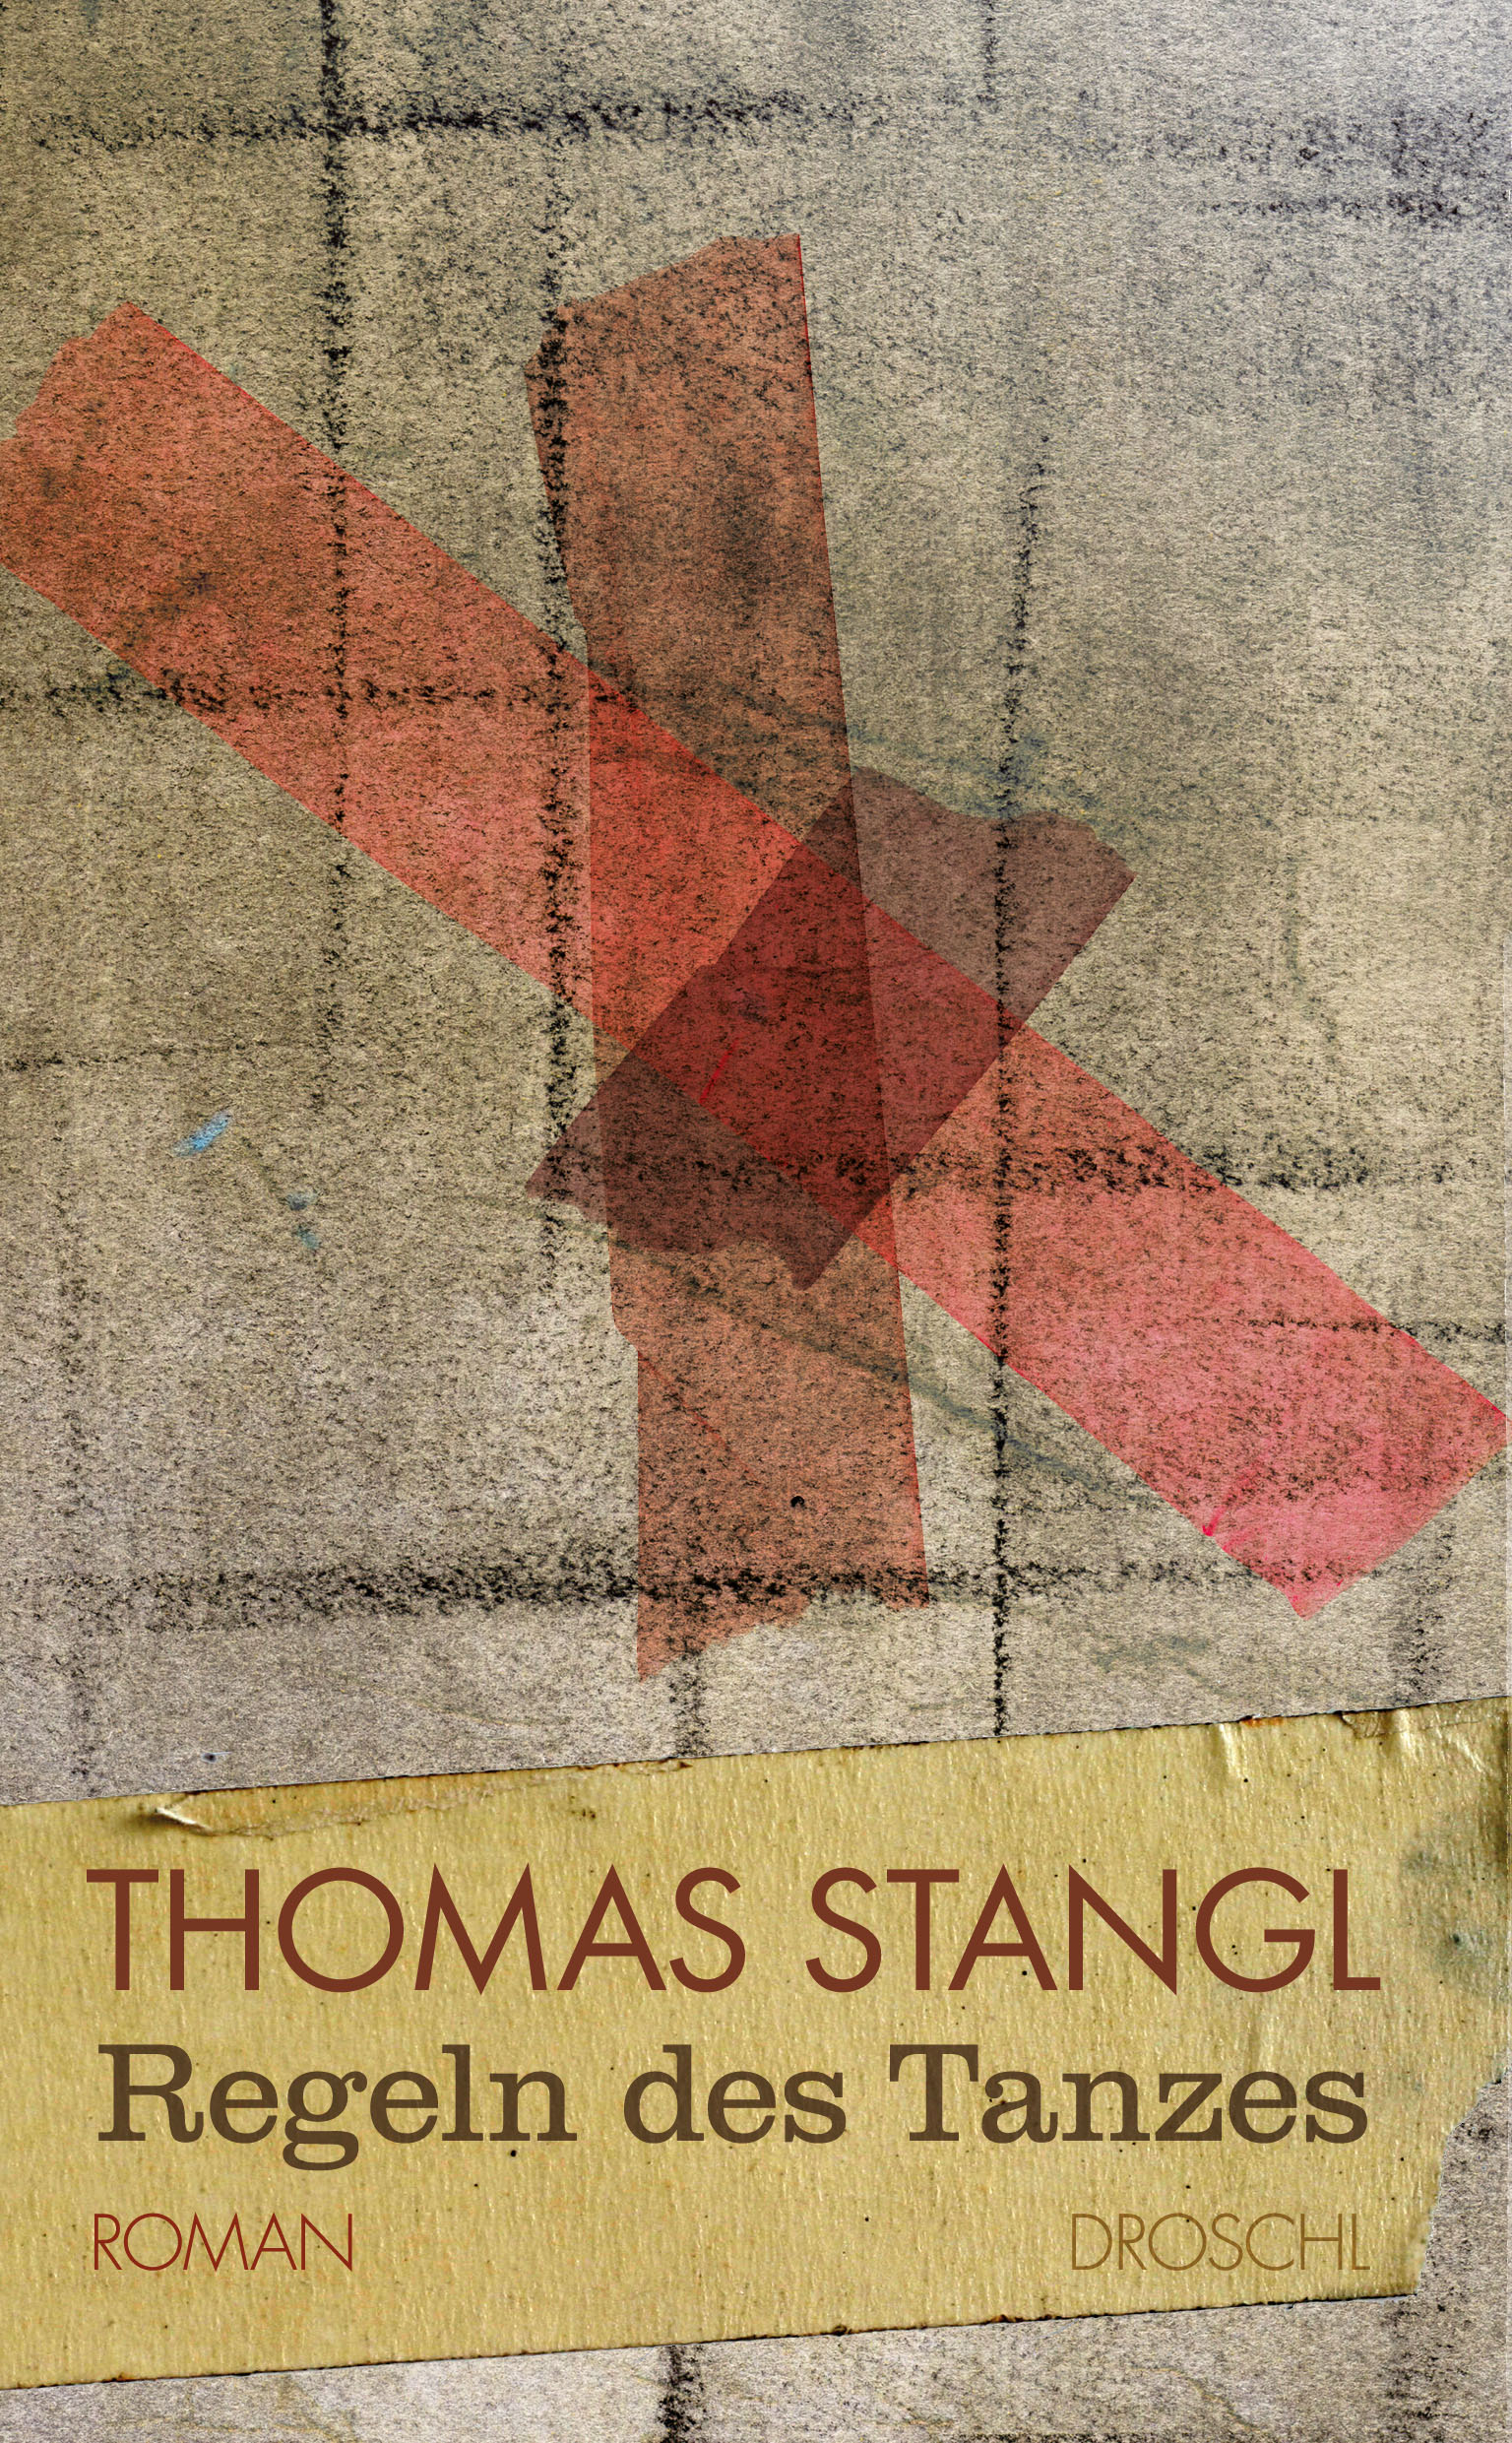 Regeln des Tanzes - Thomas Stangl